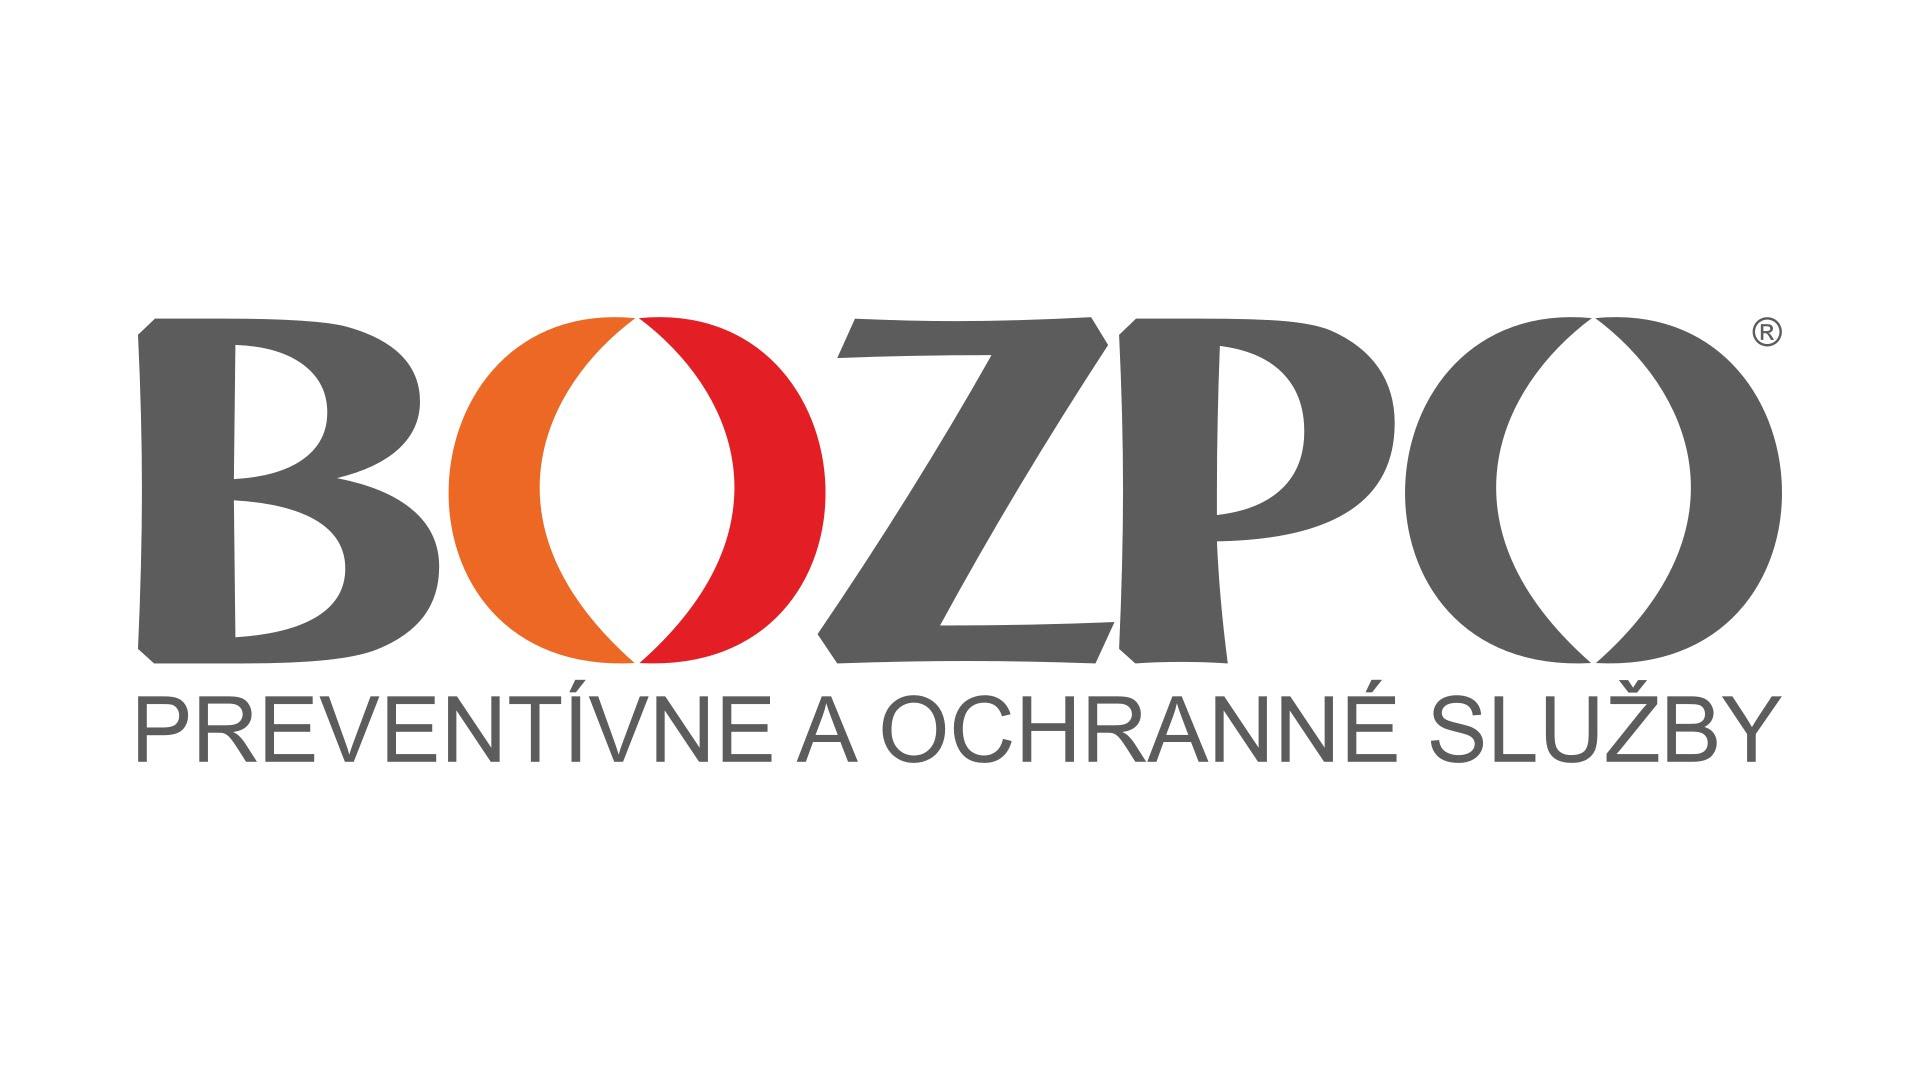 <p>BOZPO</p>